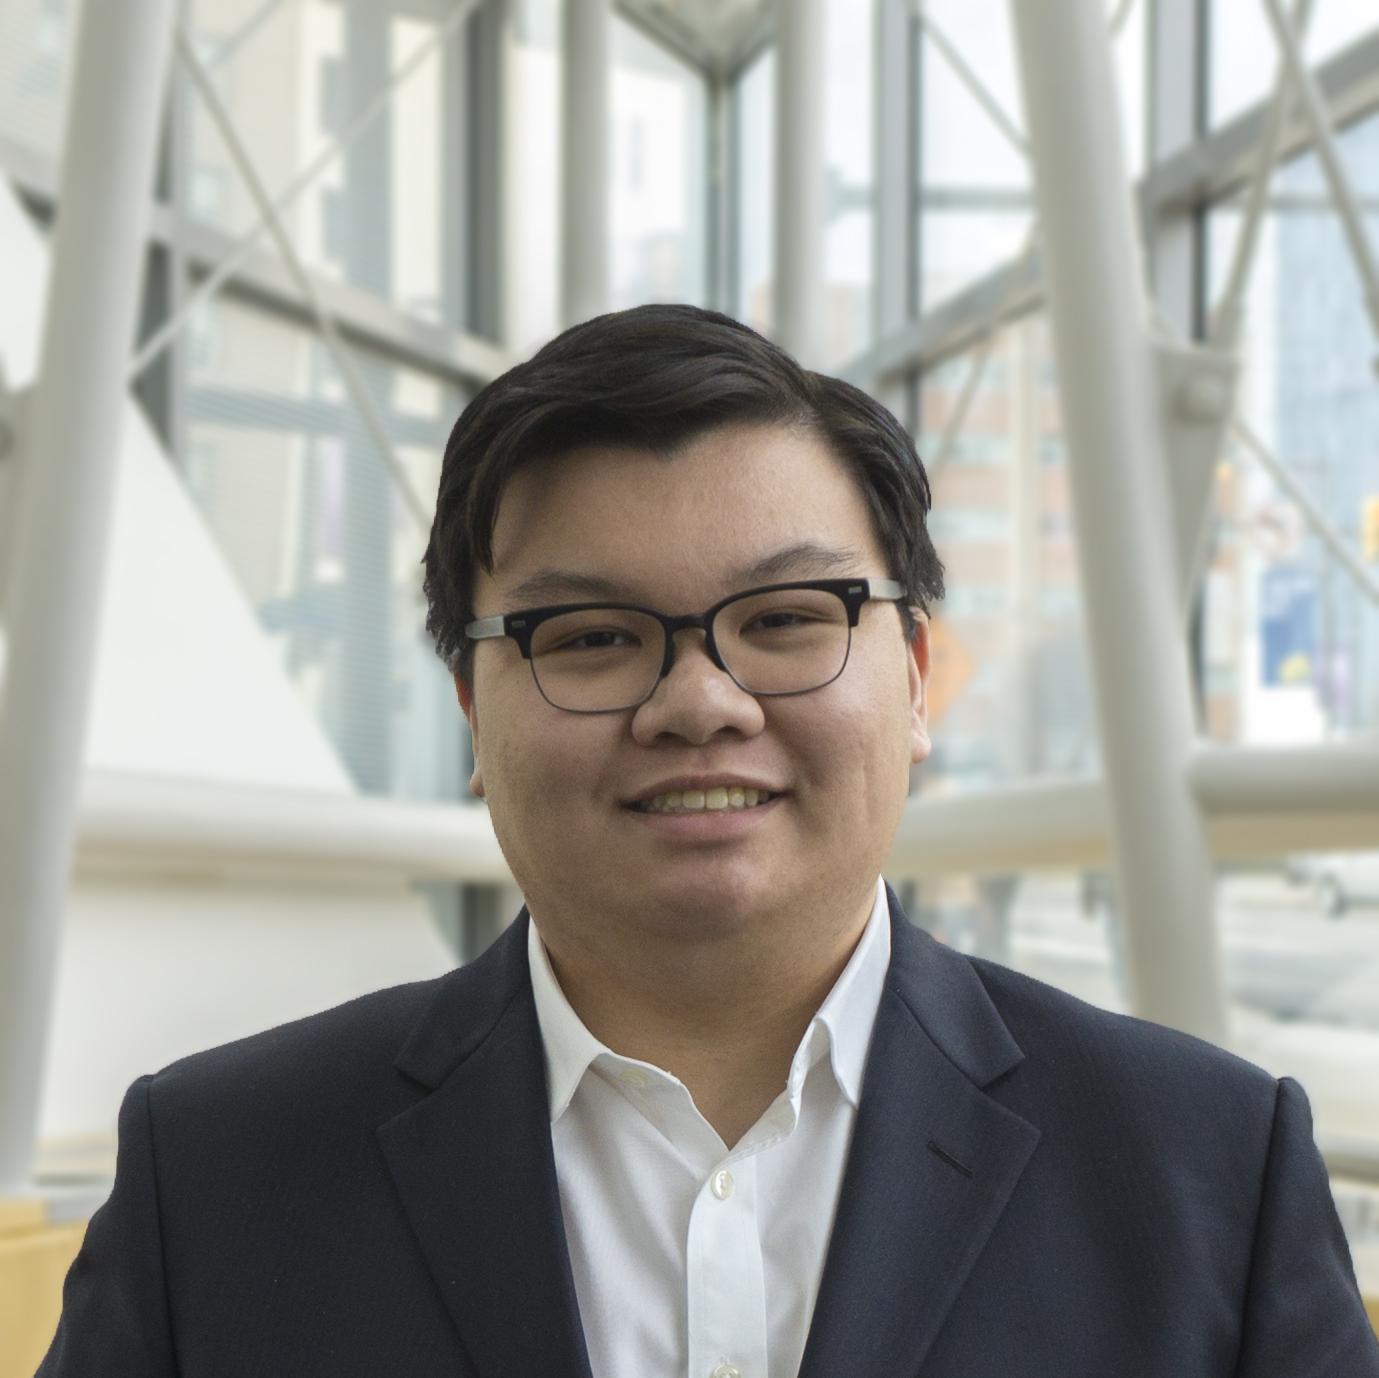 Kevin Wong Potrait.jpg